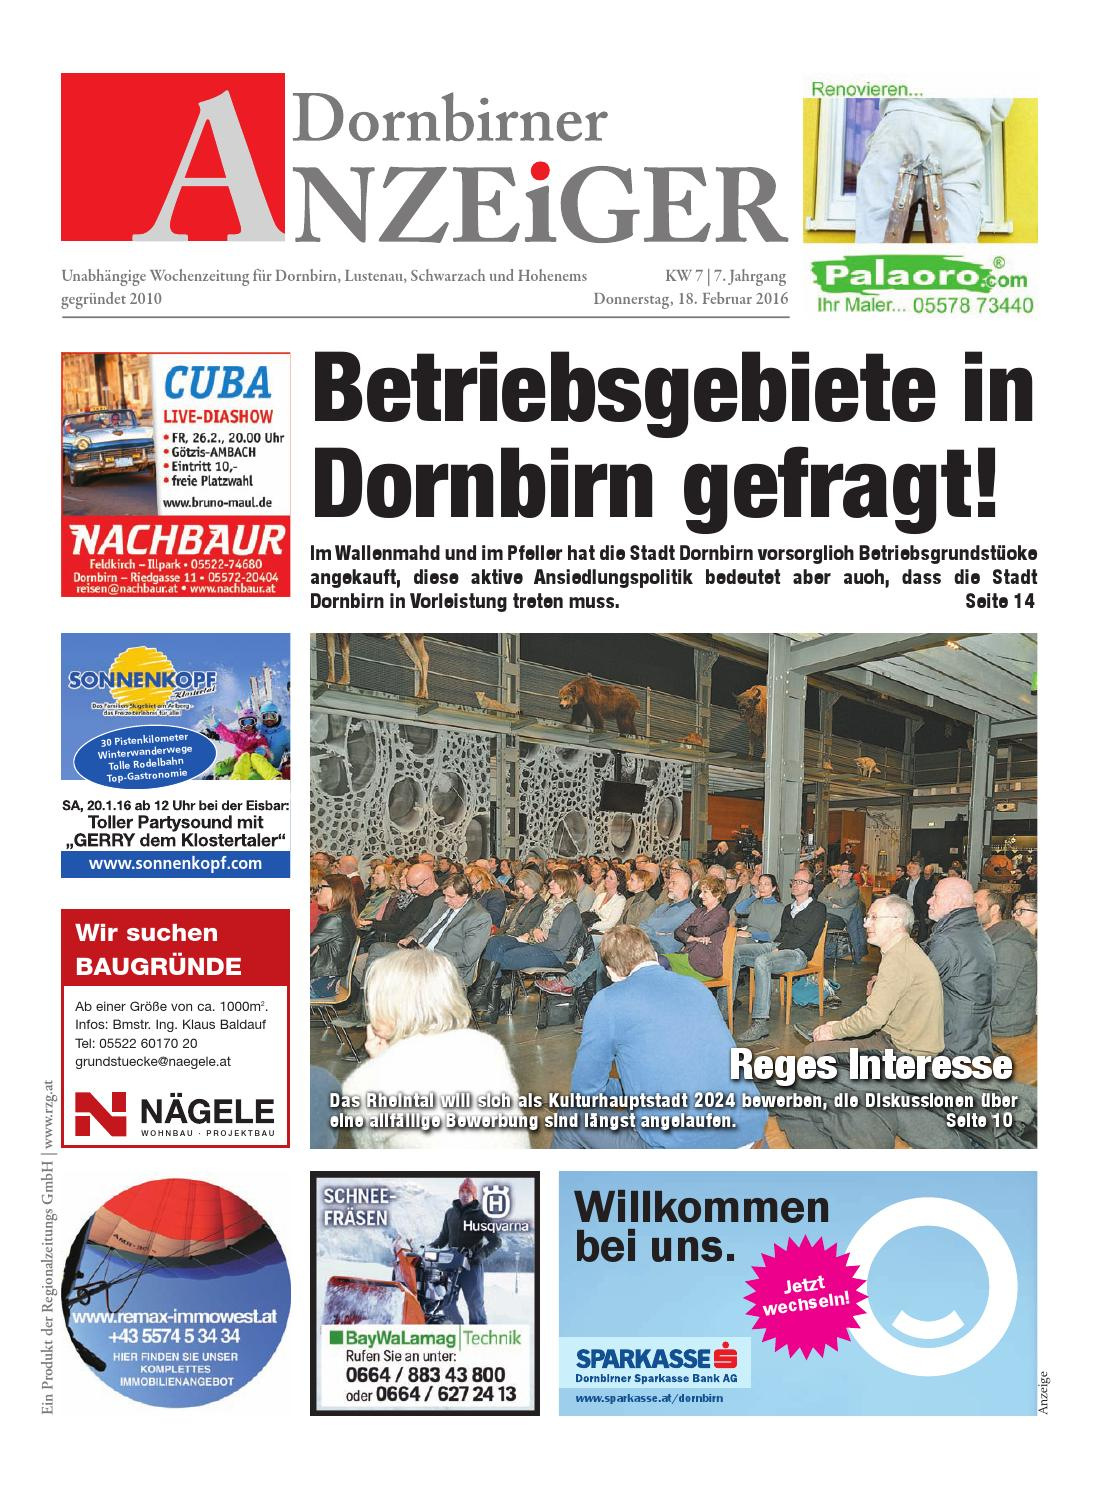 Bekanntschaften Dornbirn - huggology.com - Kleinanzeigen